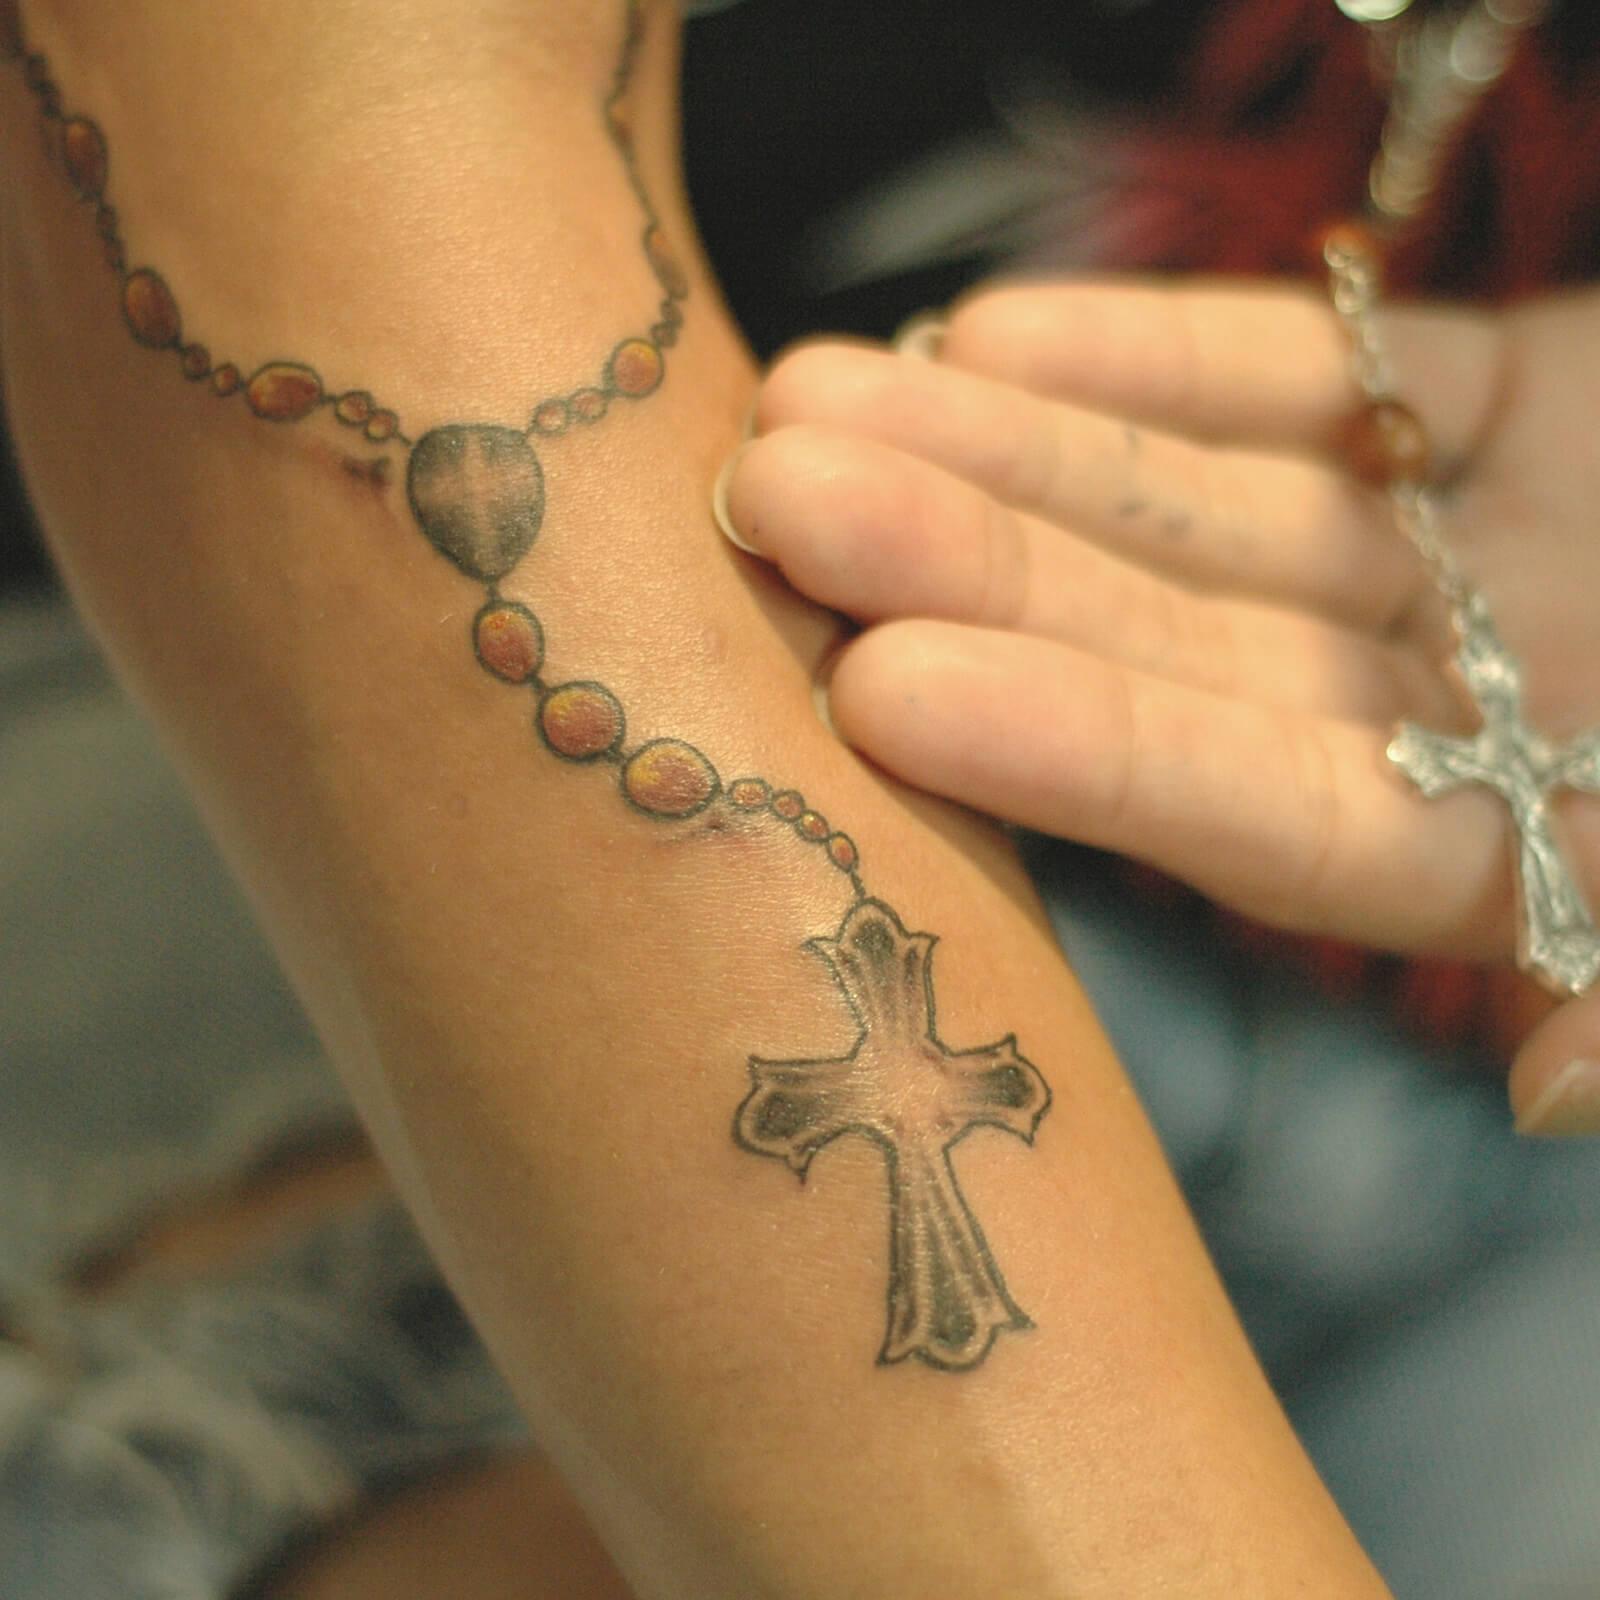 1-tattoo-drawings-crosses.jpg